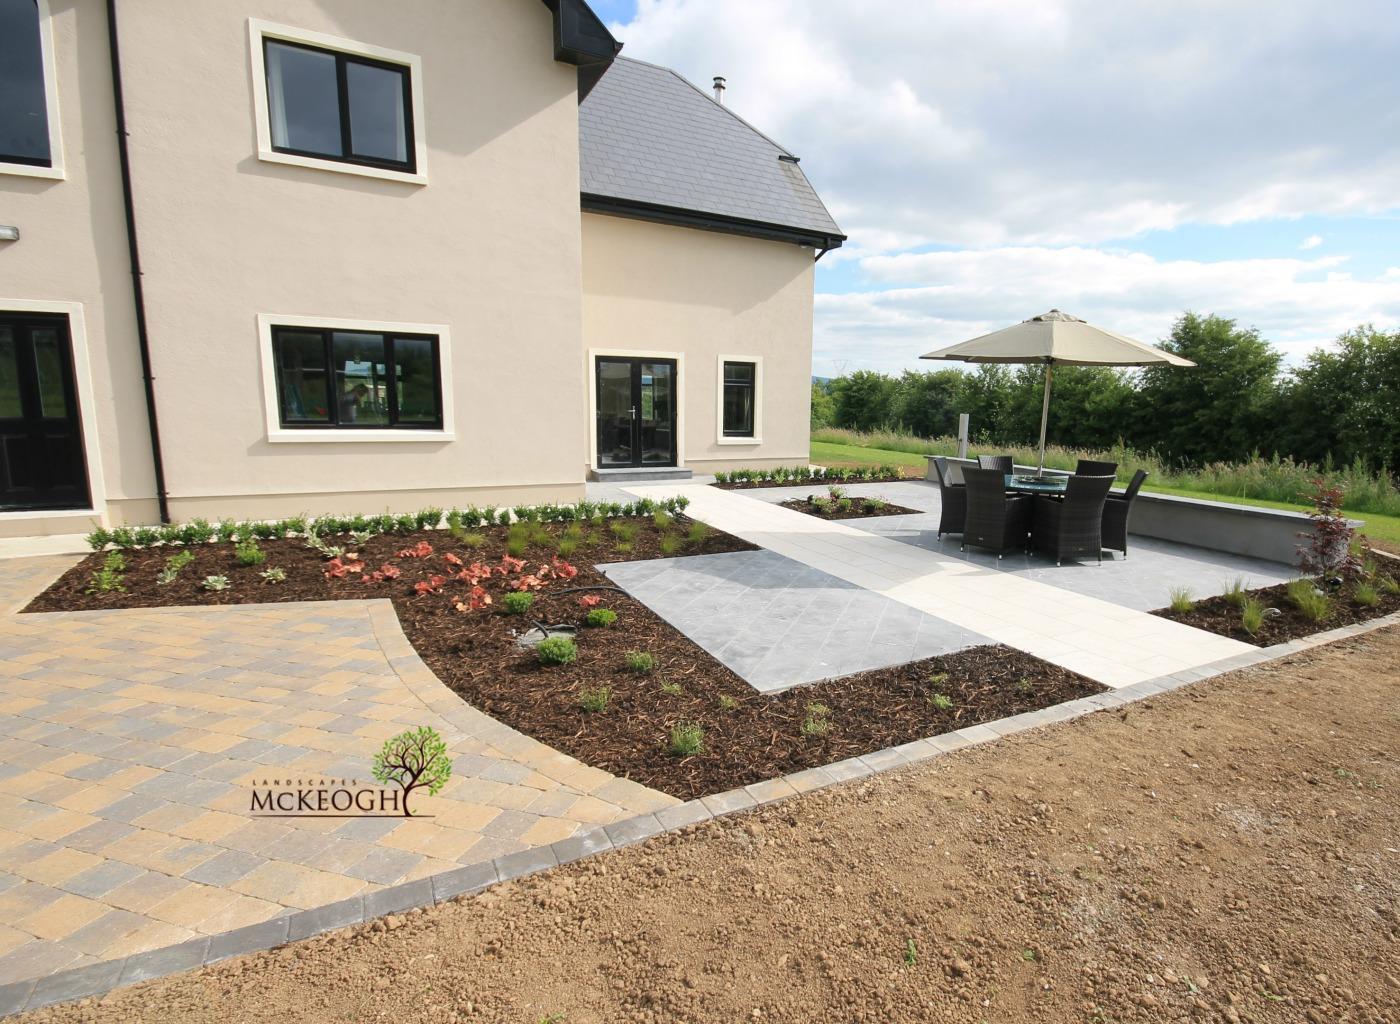 garden-driveway-patio-paving-nenagh